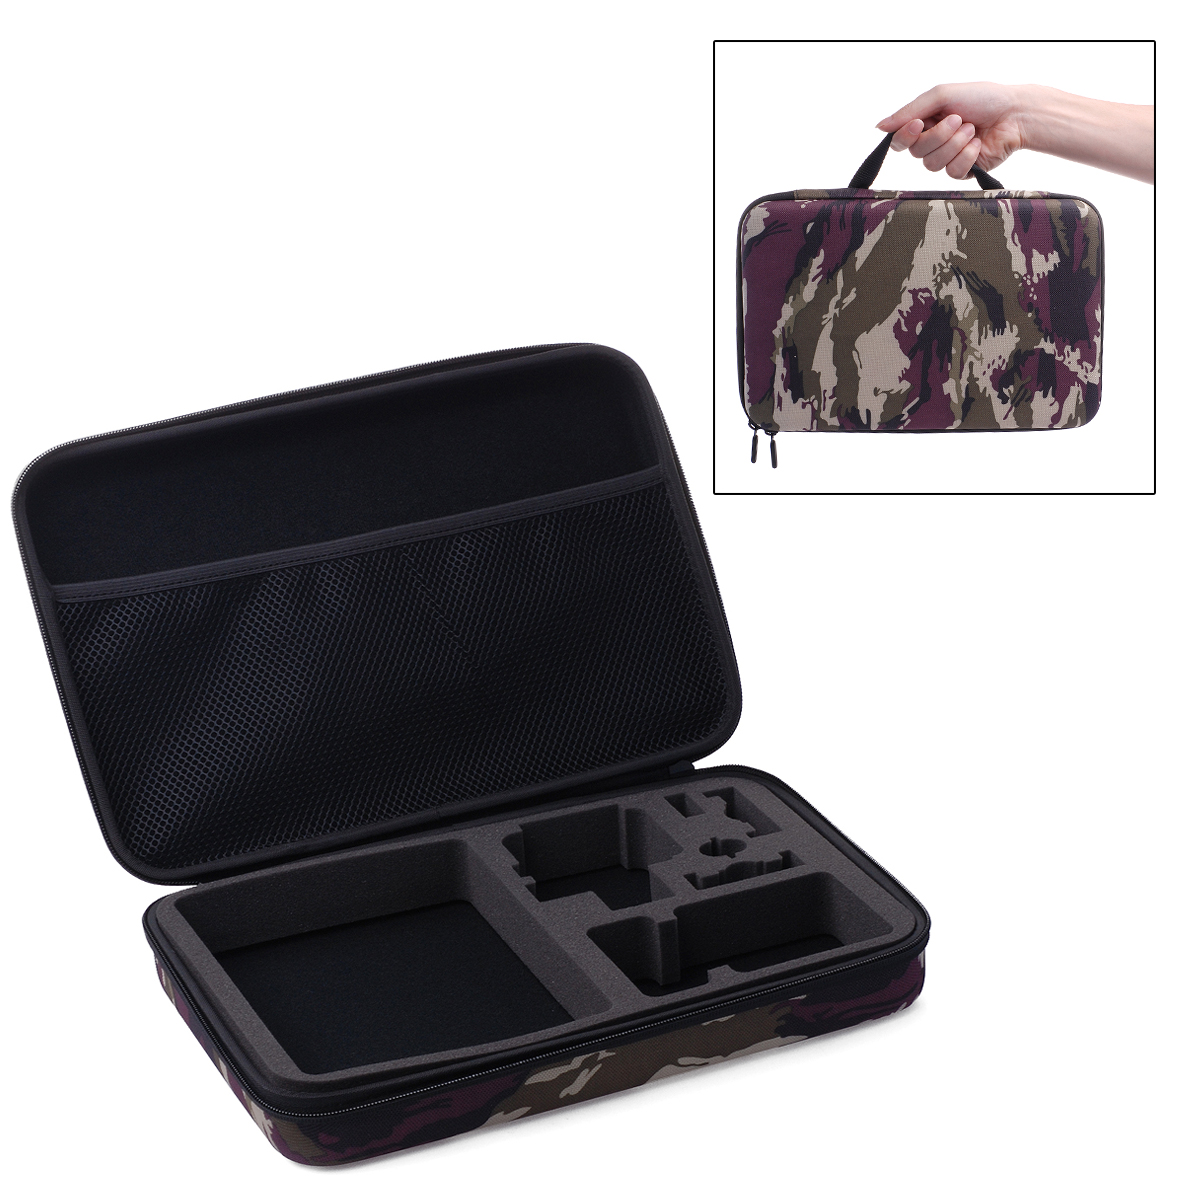 Camo Storage Carry Case Bag for Gopro Hero 3+ 3 2 1 Camera Accessories 32x21x6cm OS159(China (Mainland))